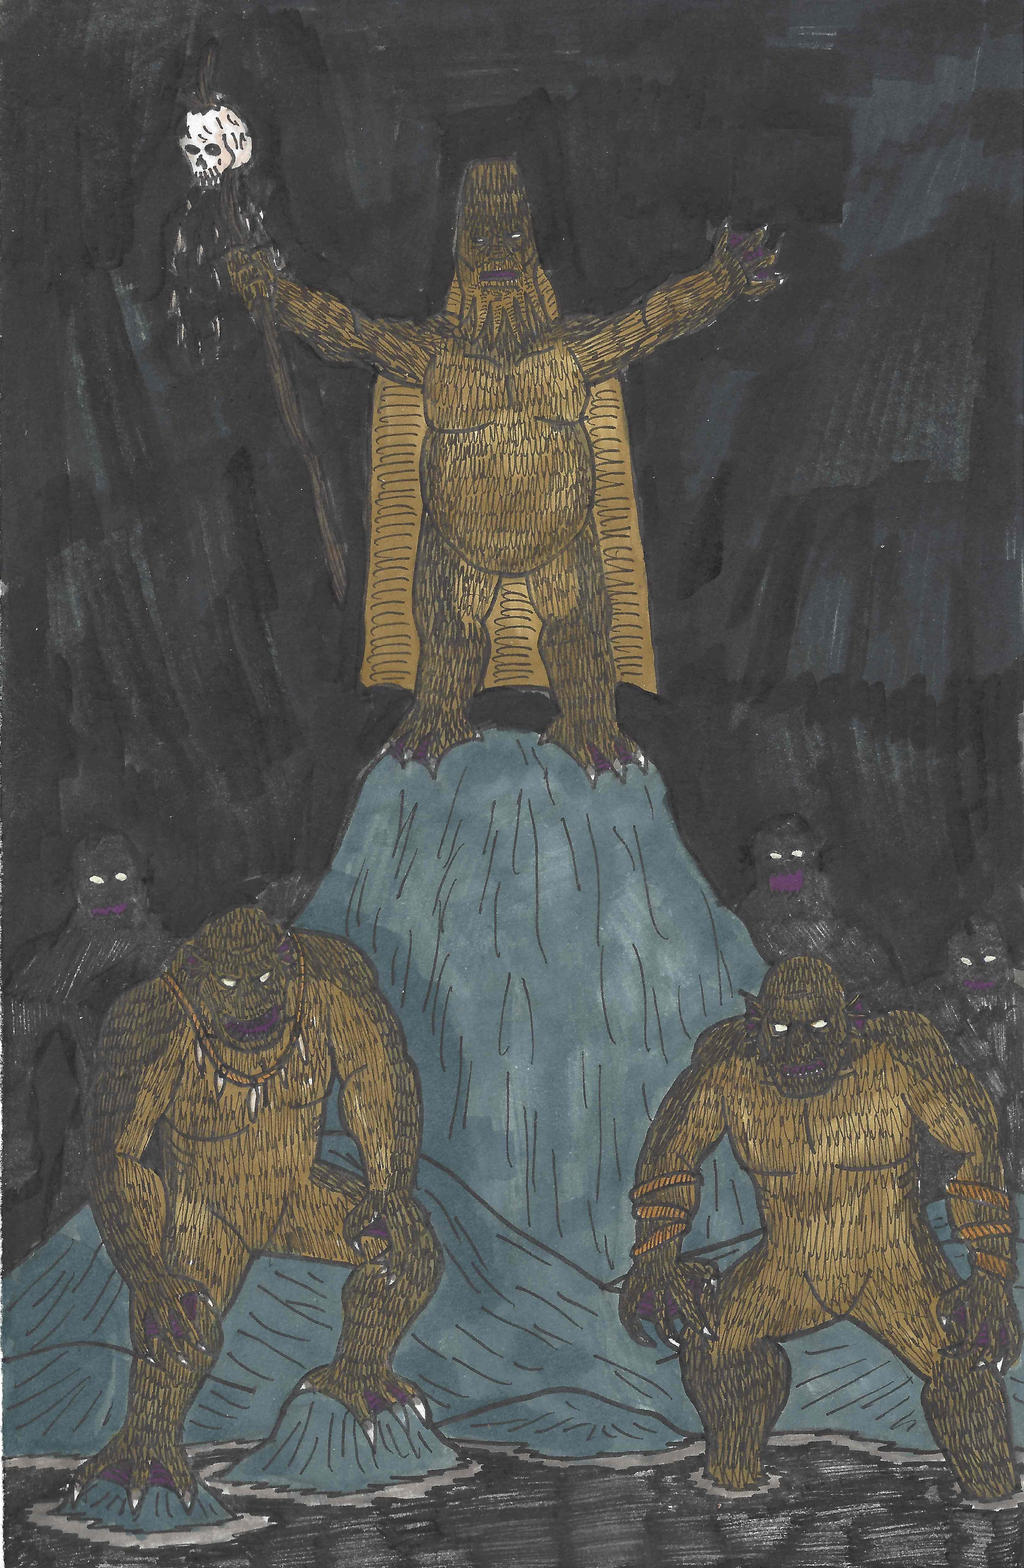 Fantasy Doodles 50 #3: Sea Monks